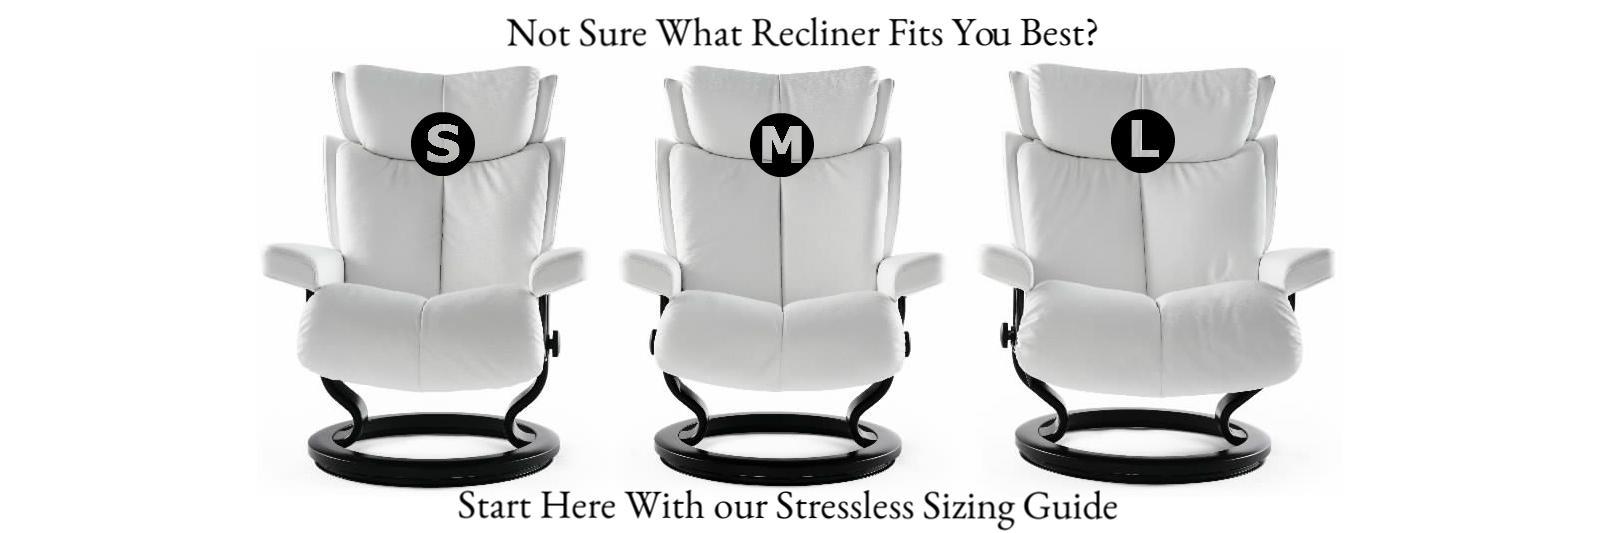 Stressless Sizes